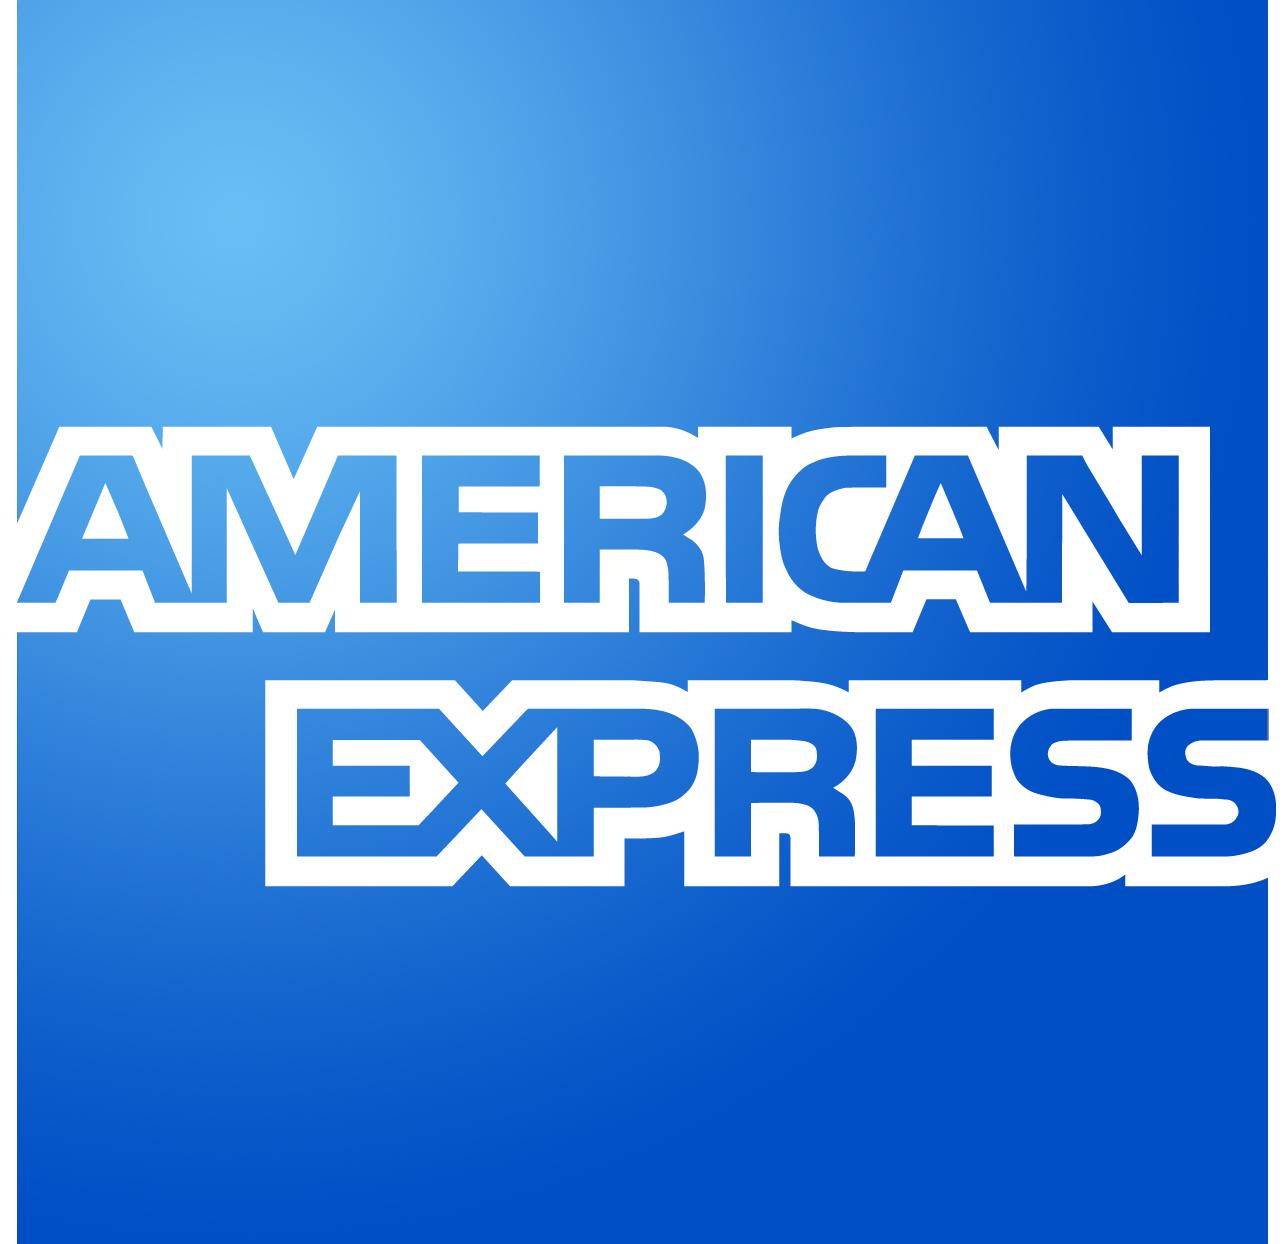 American Express Official Logo.jpg